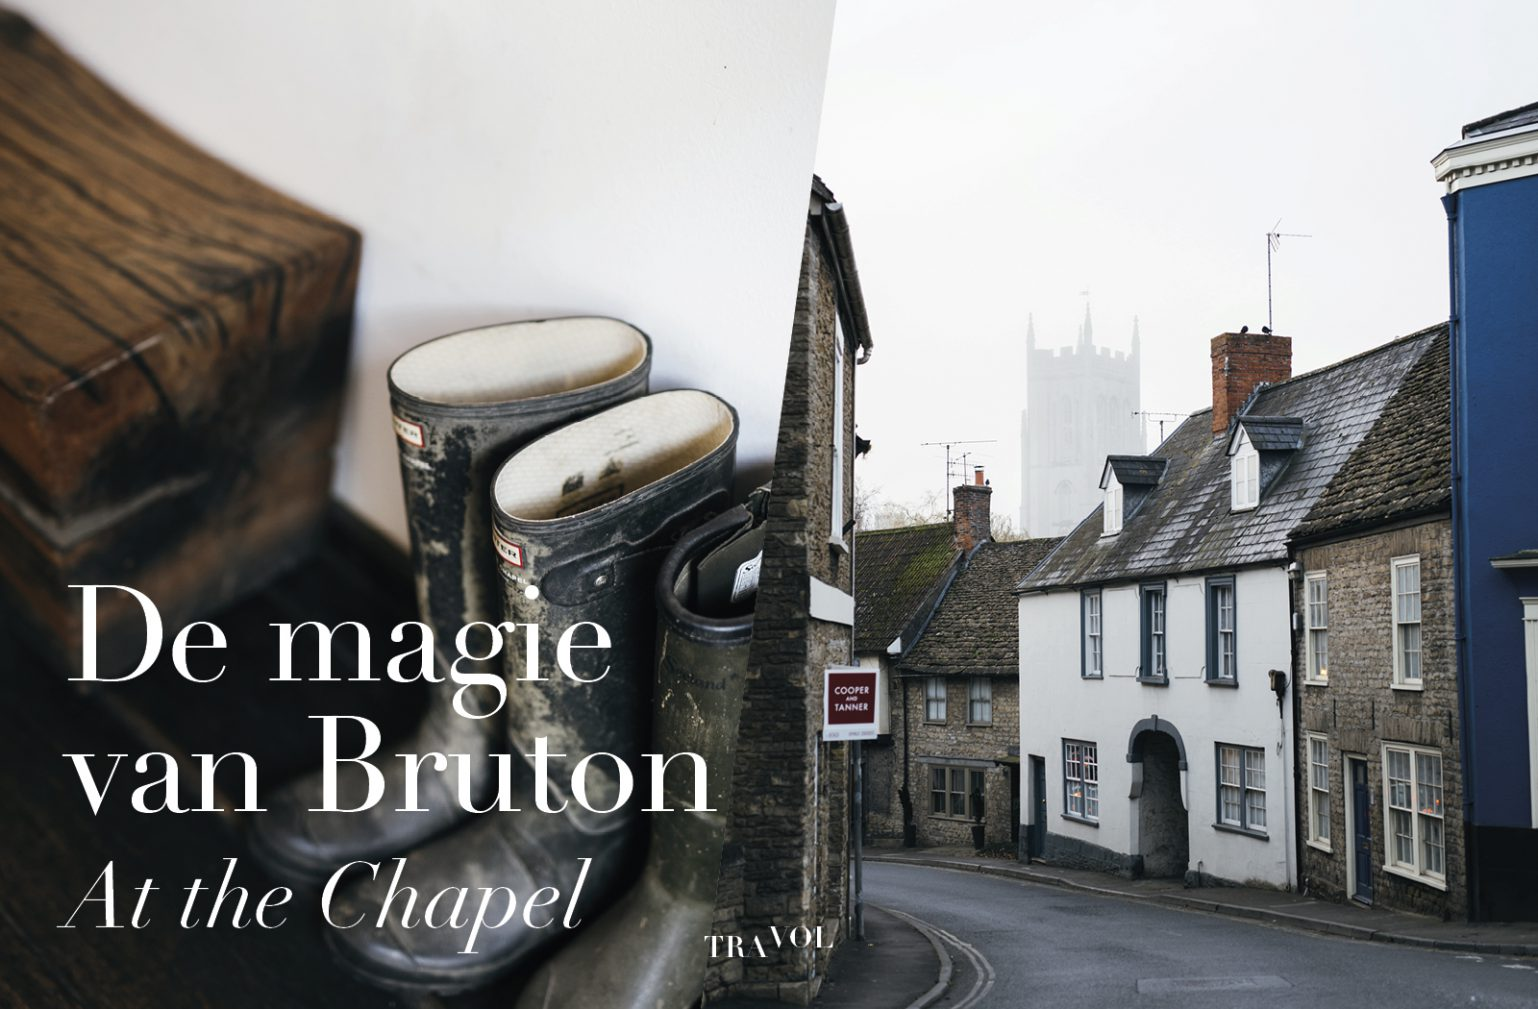 vol magazine at the chapel